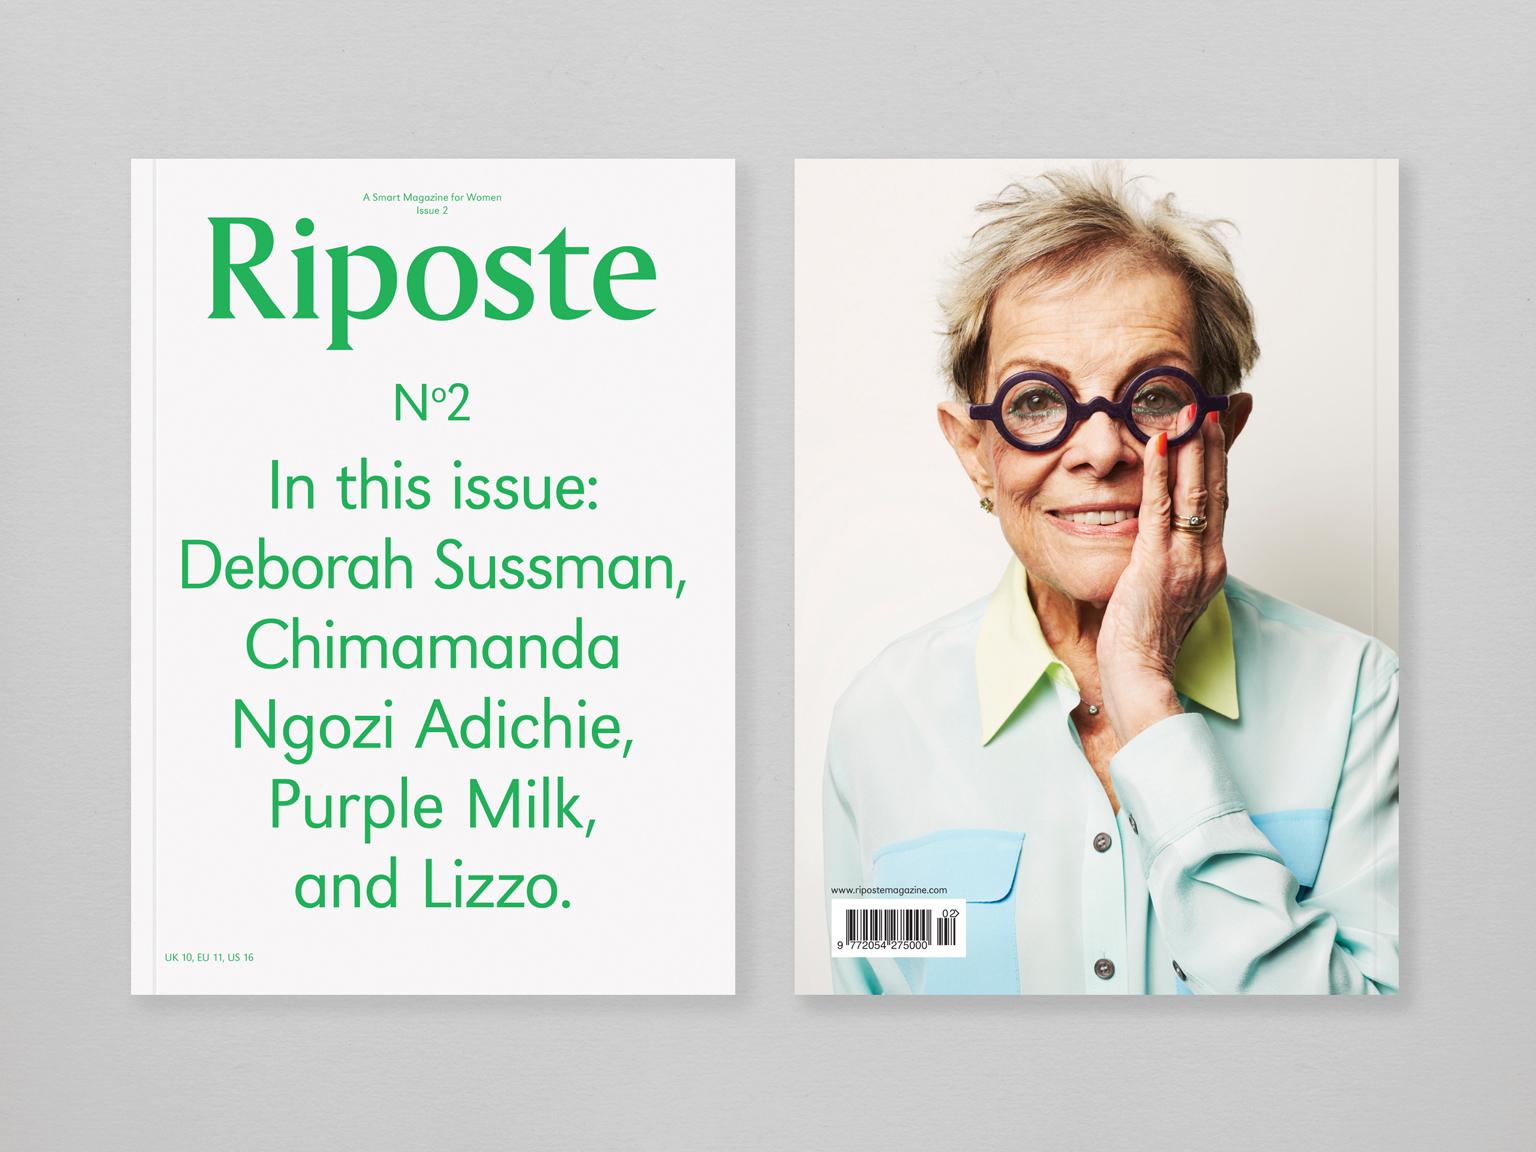 Cover of Riposte magazine issue 2, starring the late designer Deborah Sussman